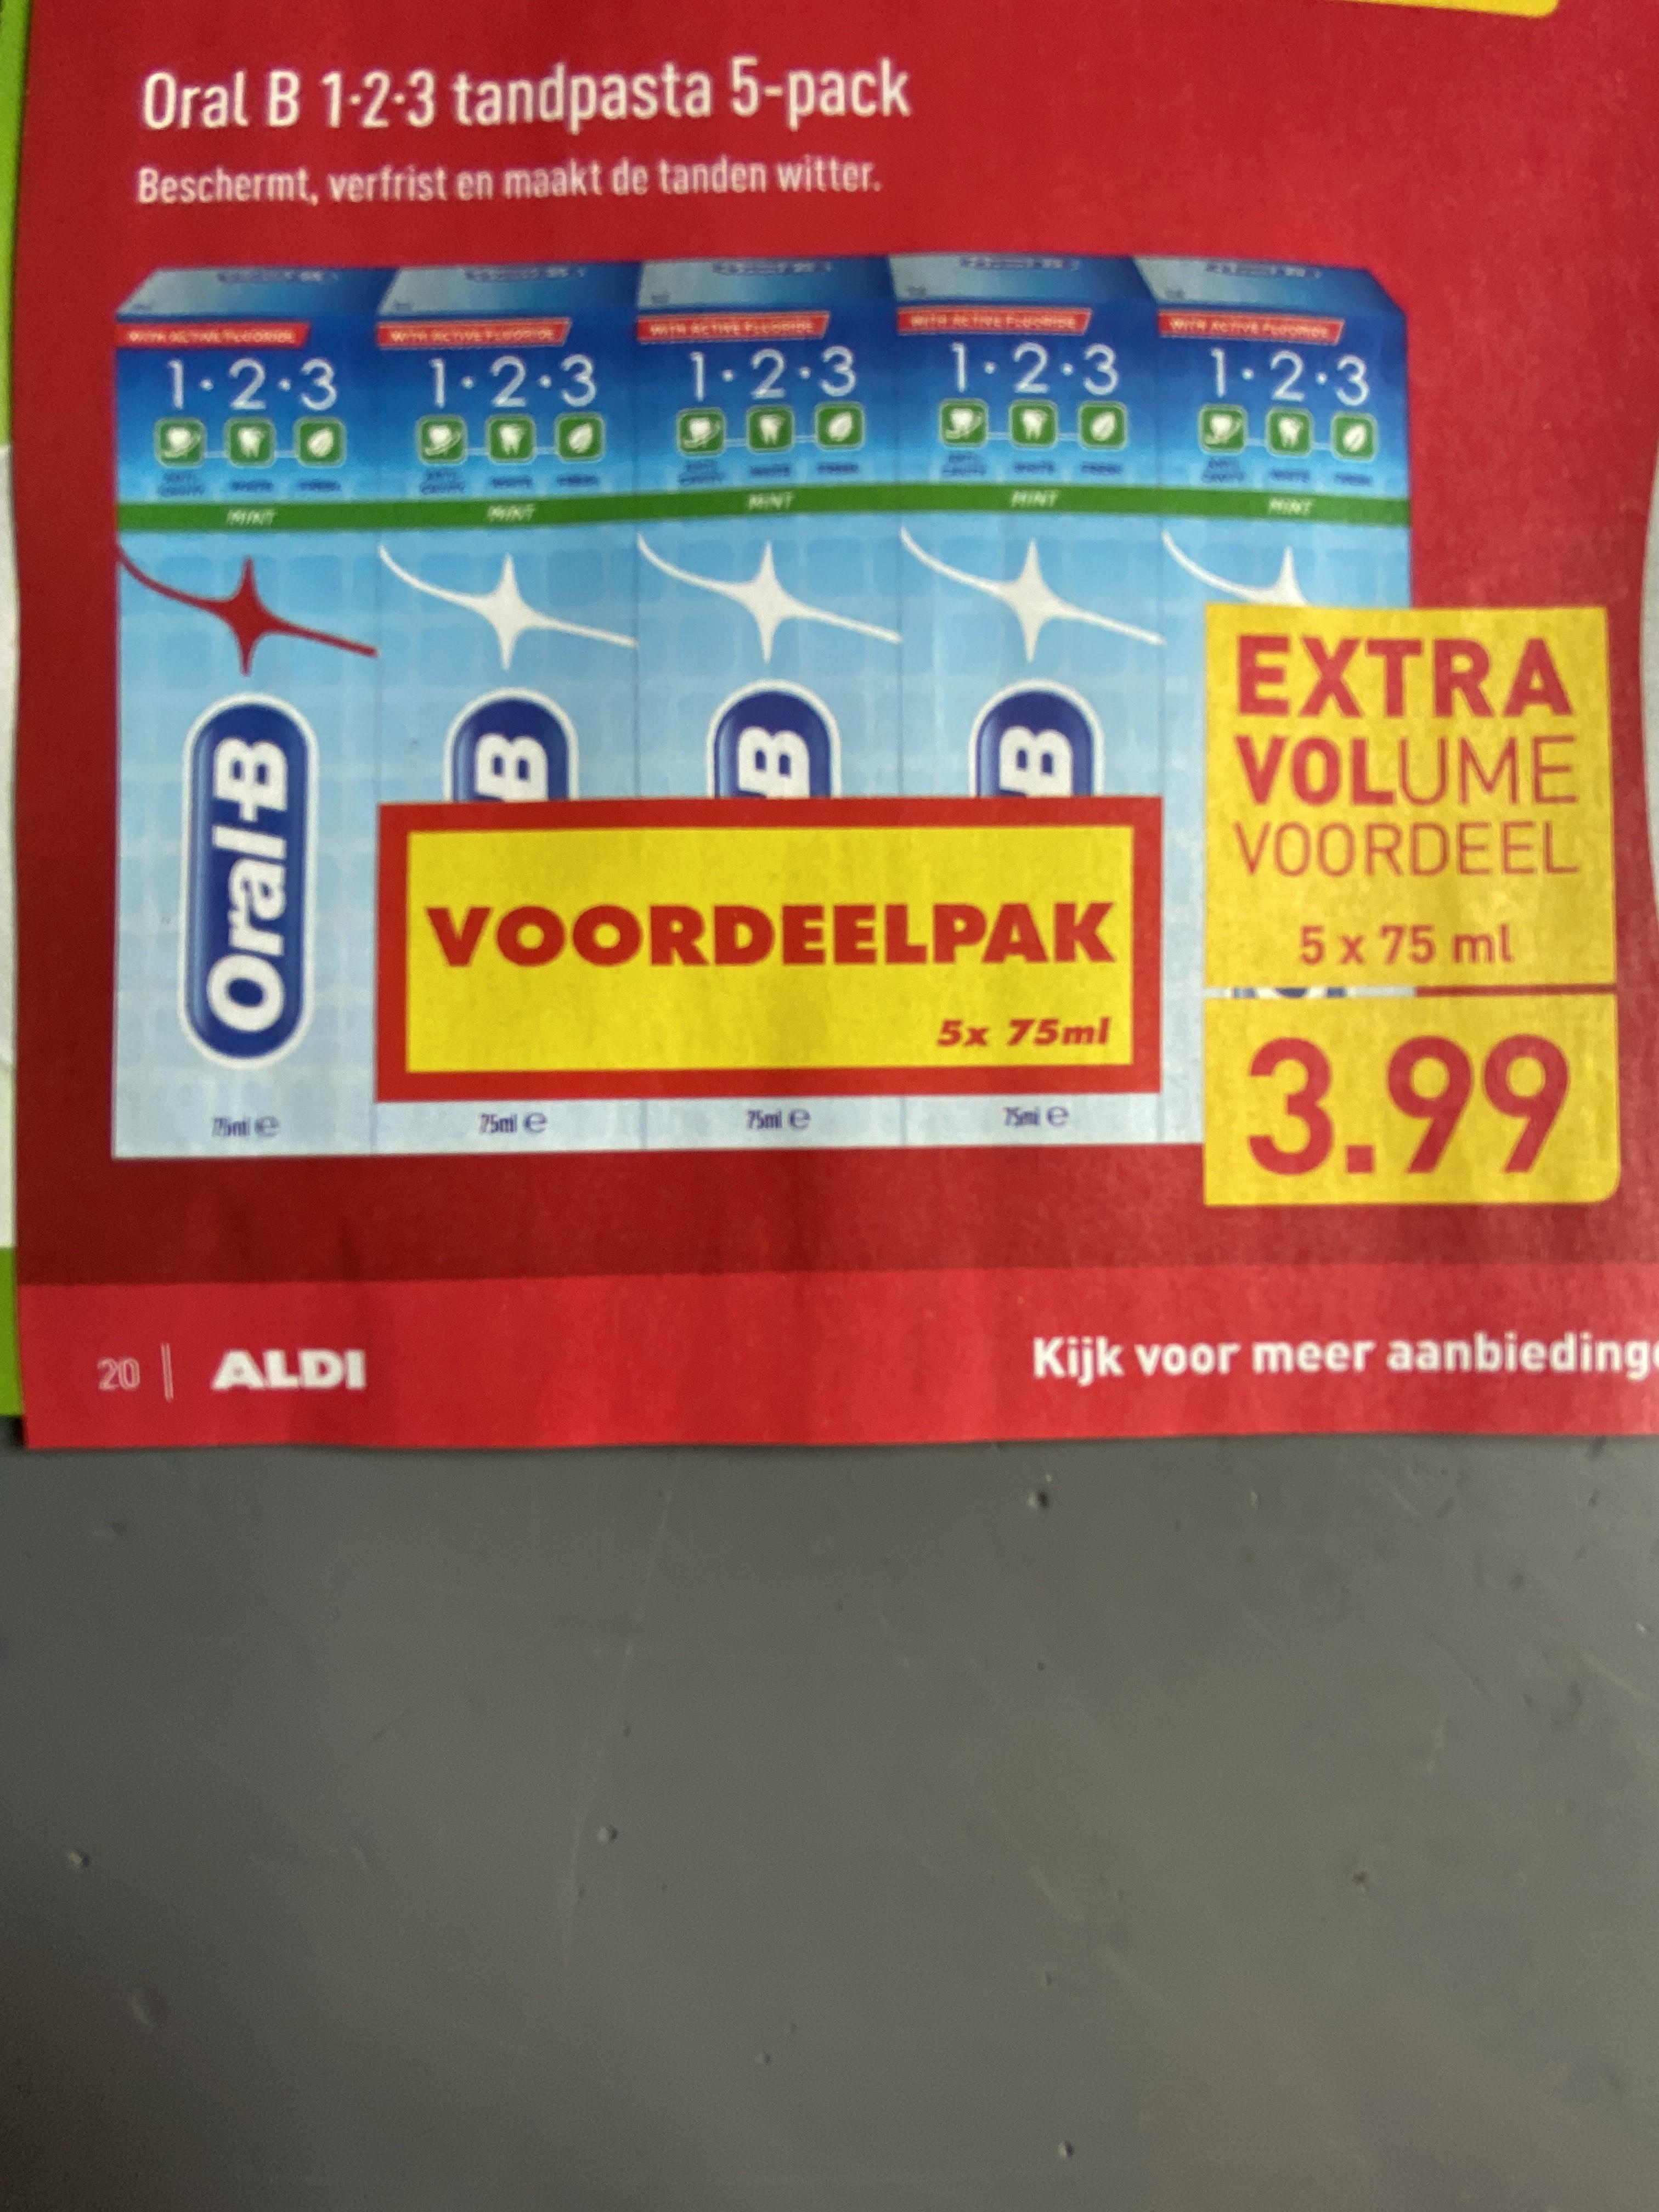 Oral B 1-2-3 tandpasta 5-pack